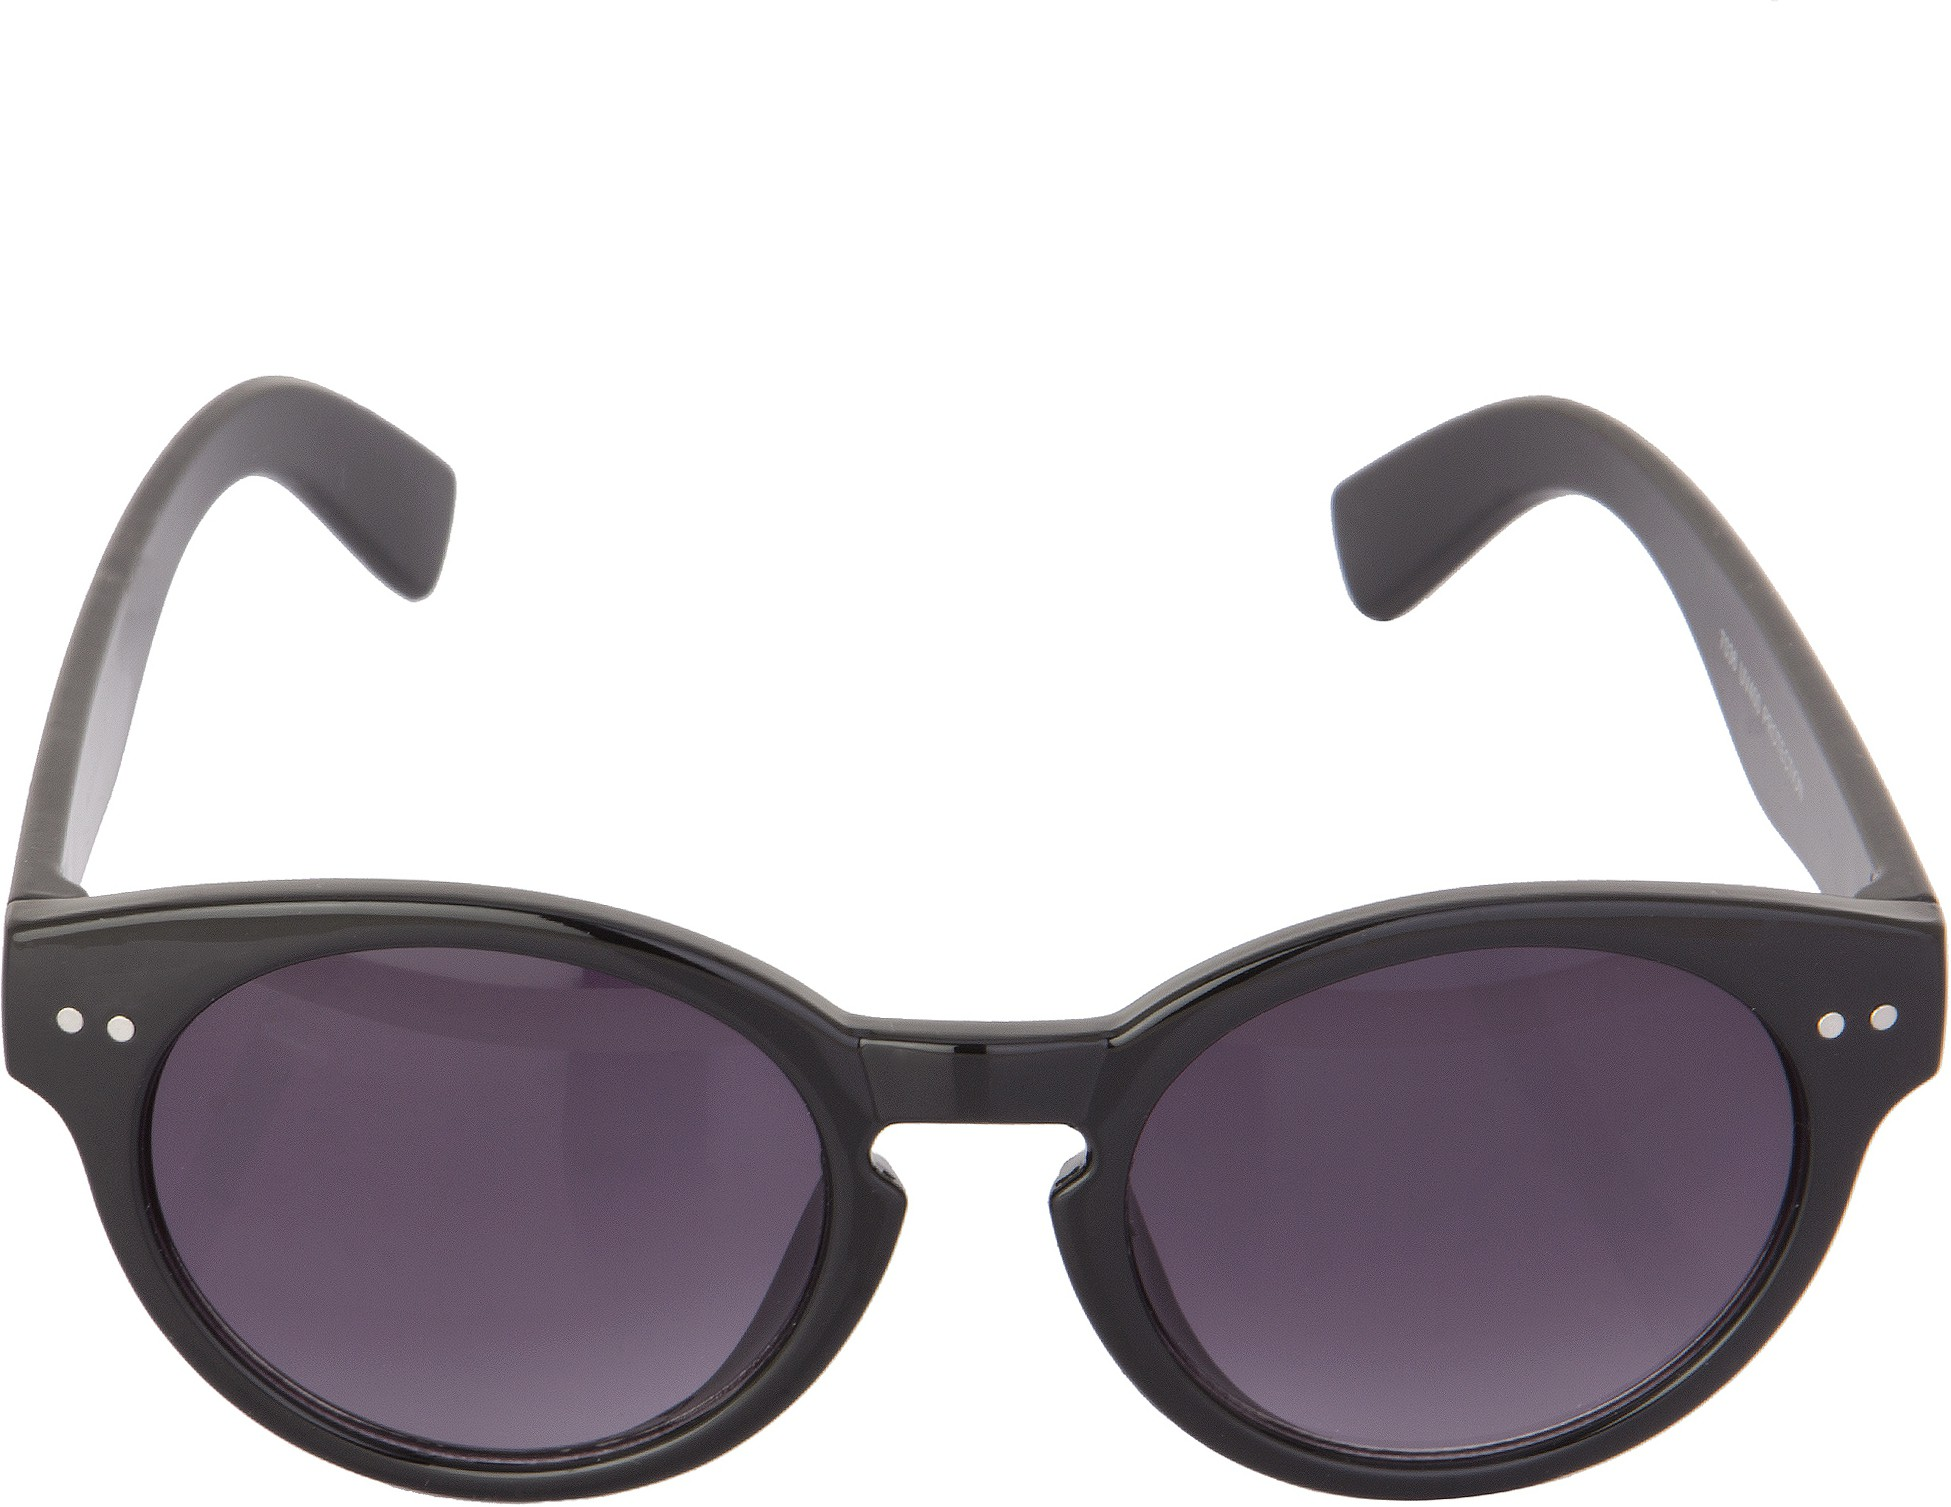 Yak International Smart Round Sunglasses